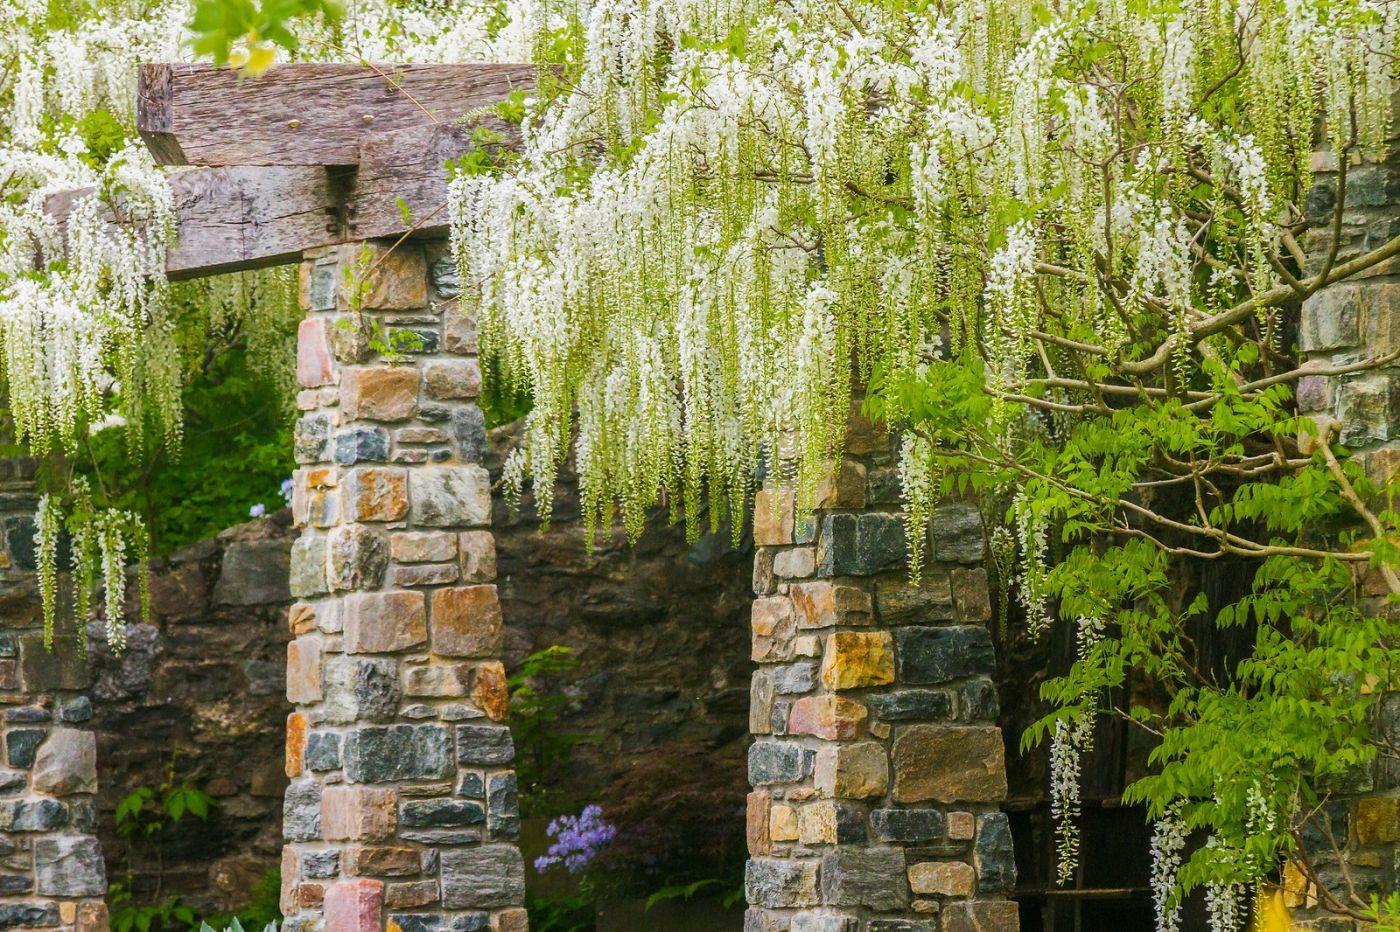 Chanticleer花园,那年盛开的紫藤花_图1-32